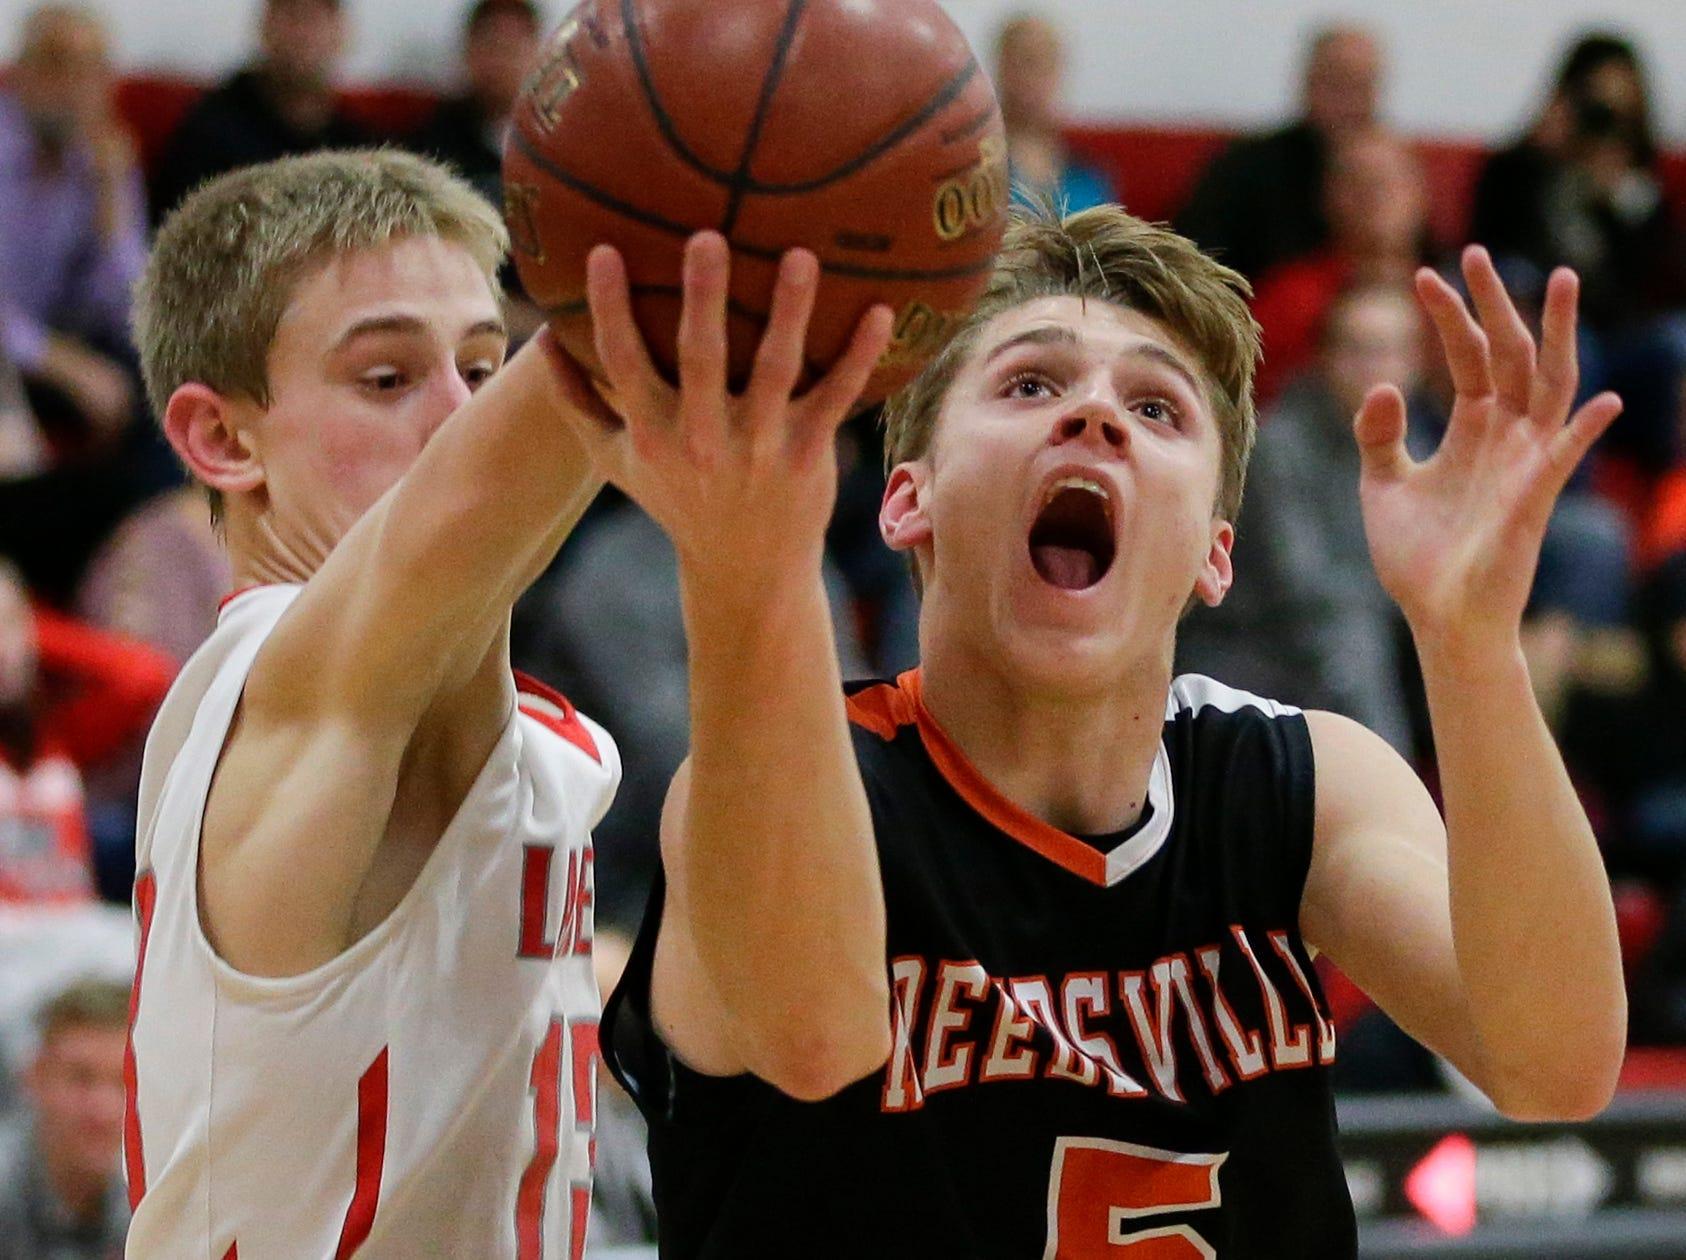 Reedsville's Brennen Dvorachek drives to the basket past Manitowoc Lutheran's Evan Lischka at Manitowoc Lutheran High School Thursday, December 20, 2018, in Manitowoc, Wis. Joshua Clark/USA TODAY NETWORK-Wisconsin